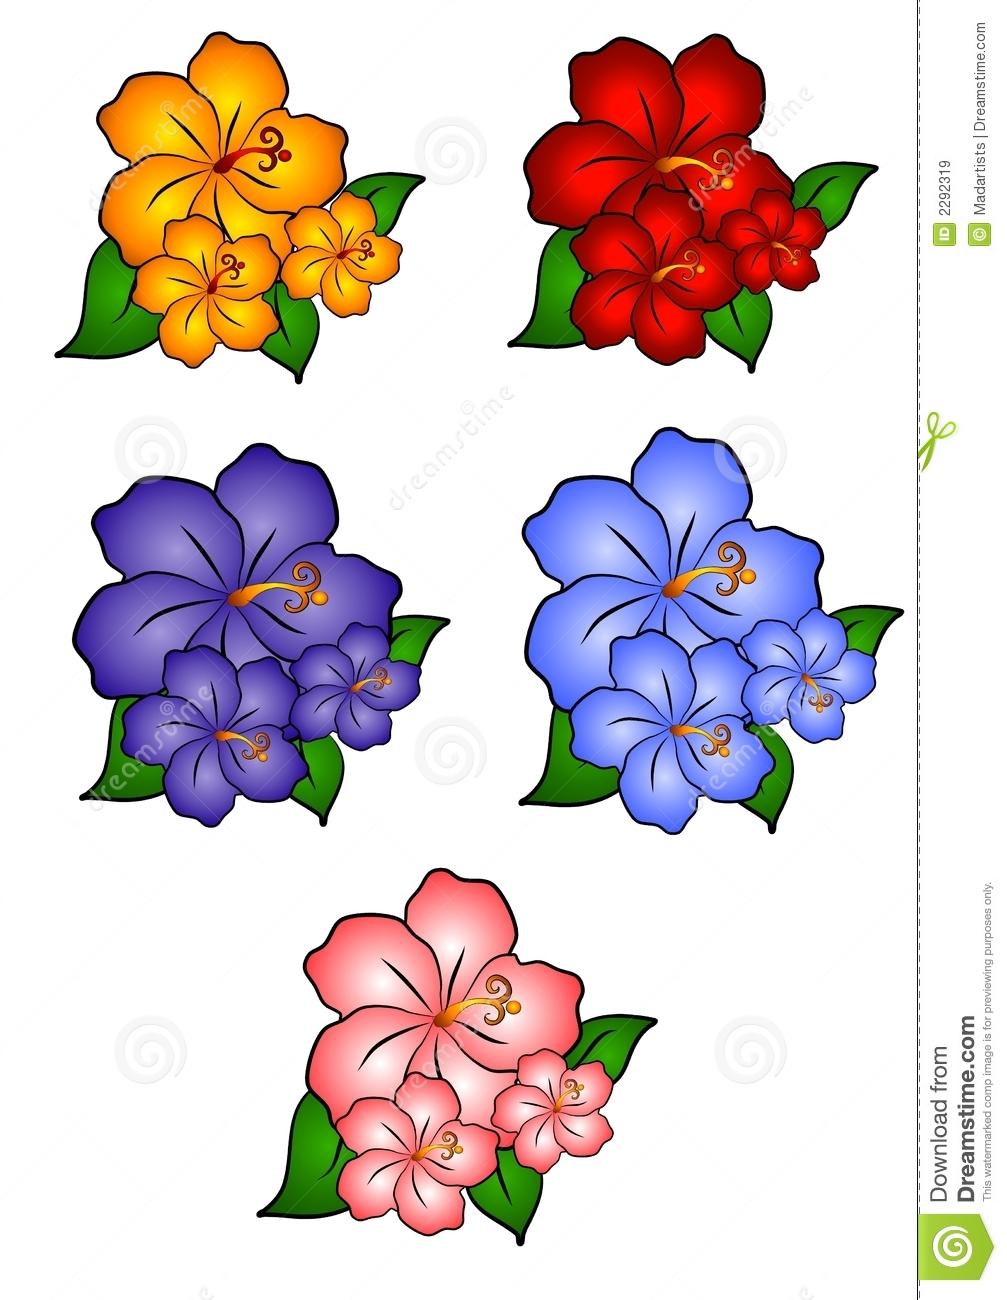 Cartoon hawaiian flowers choice image flower wallpaper hd cartoon hawaiian flowers image collections flower wallpaper hd cartoon hawaiian flowers choice image flower wallpaper hd izmirmasajfo Gallery